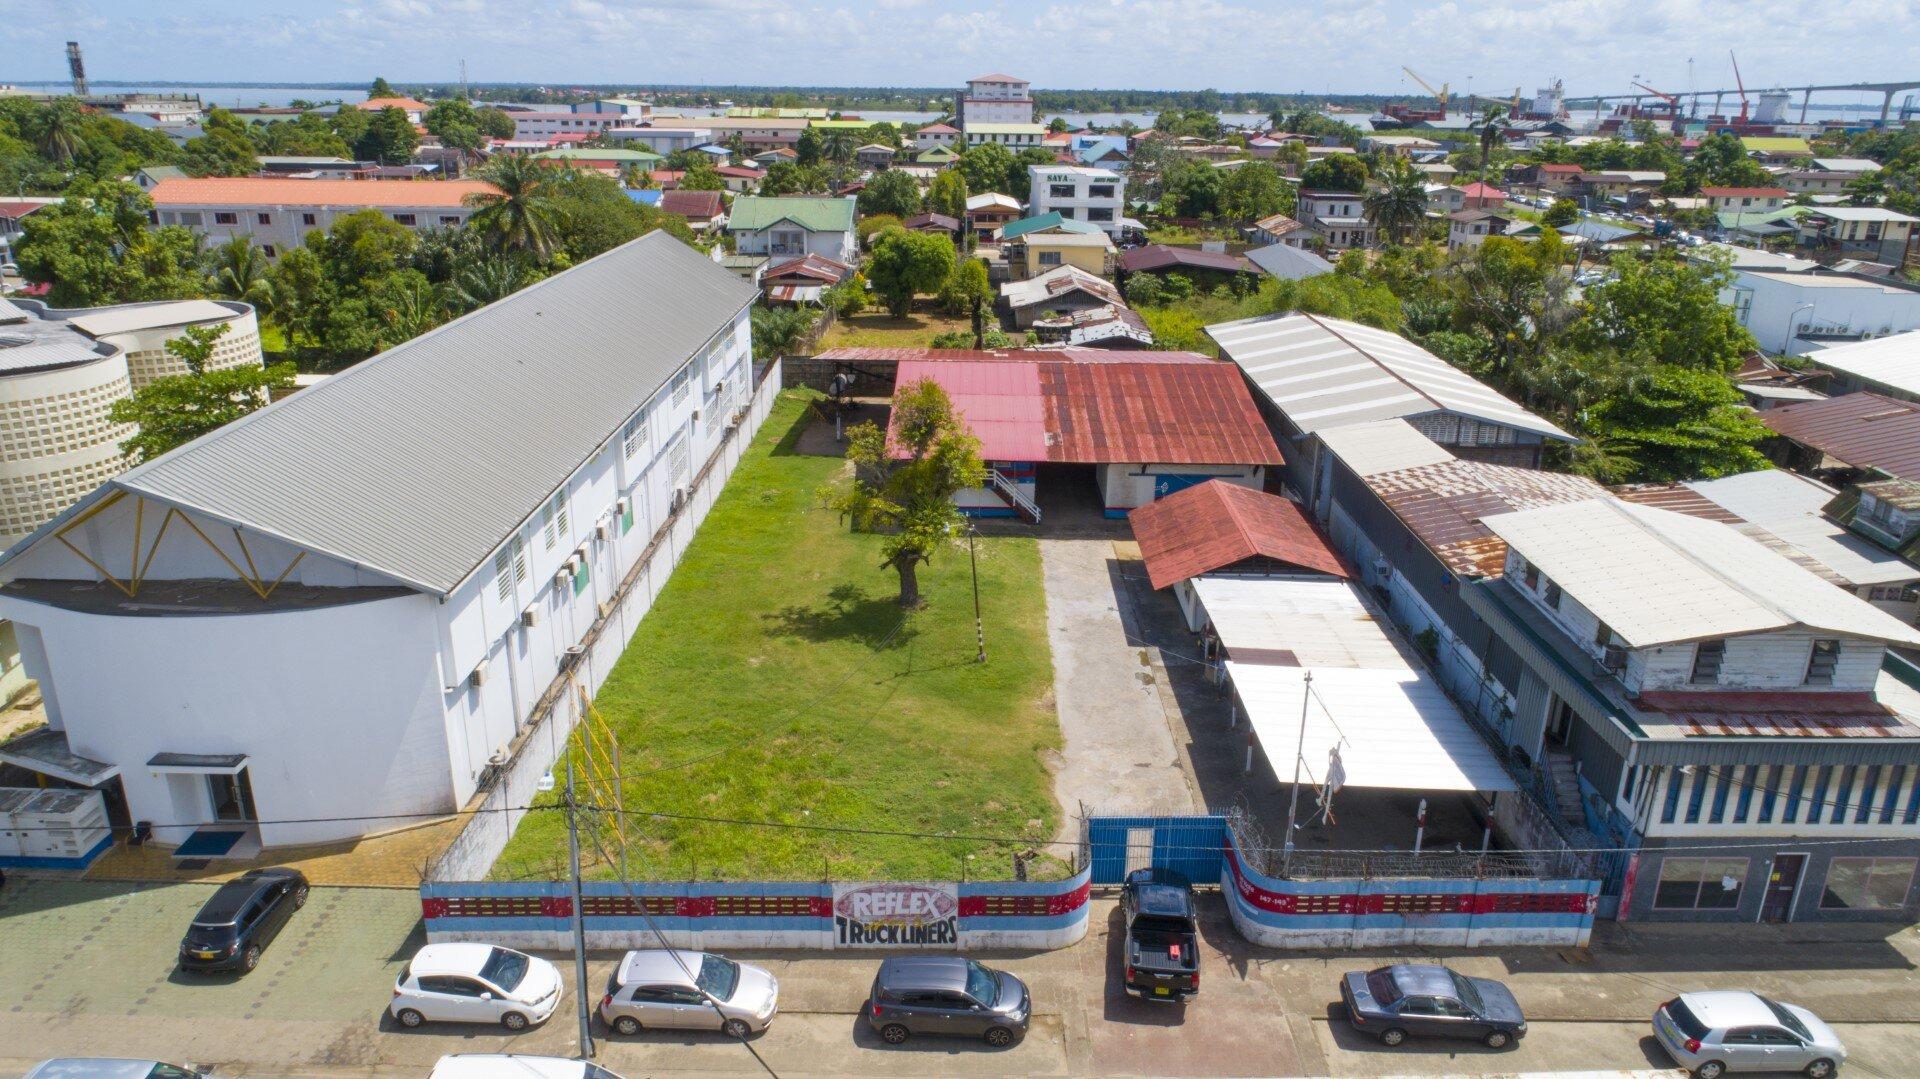 Frederik Derbystraat 147-149 - Werkplek in gemakkelijk bereikbare omgeving - Surgoed Makelaardij NV - Paramaribo, Suriname